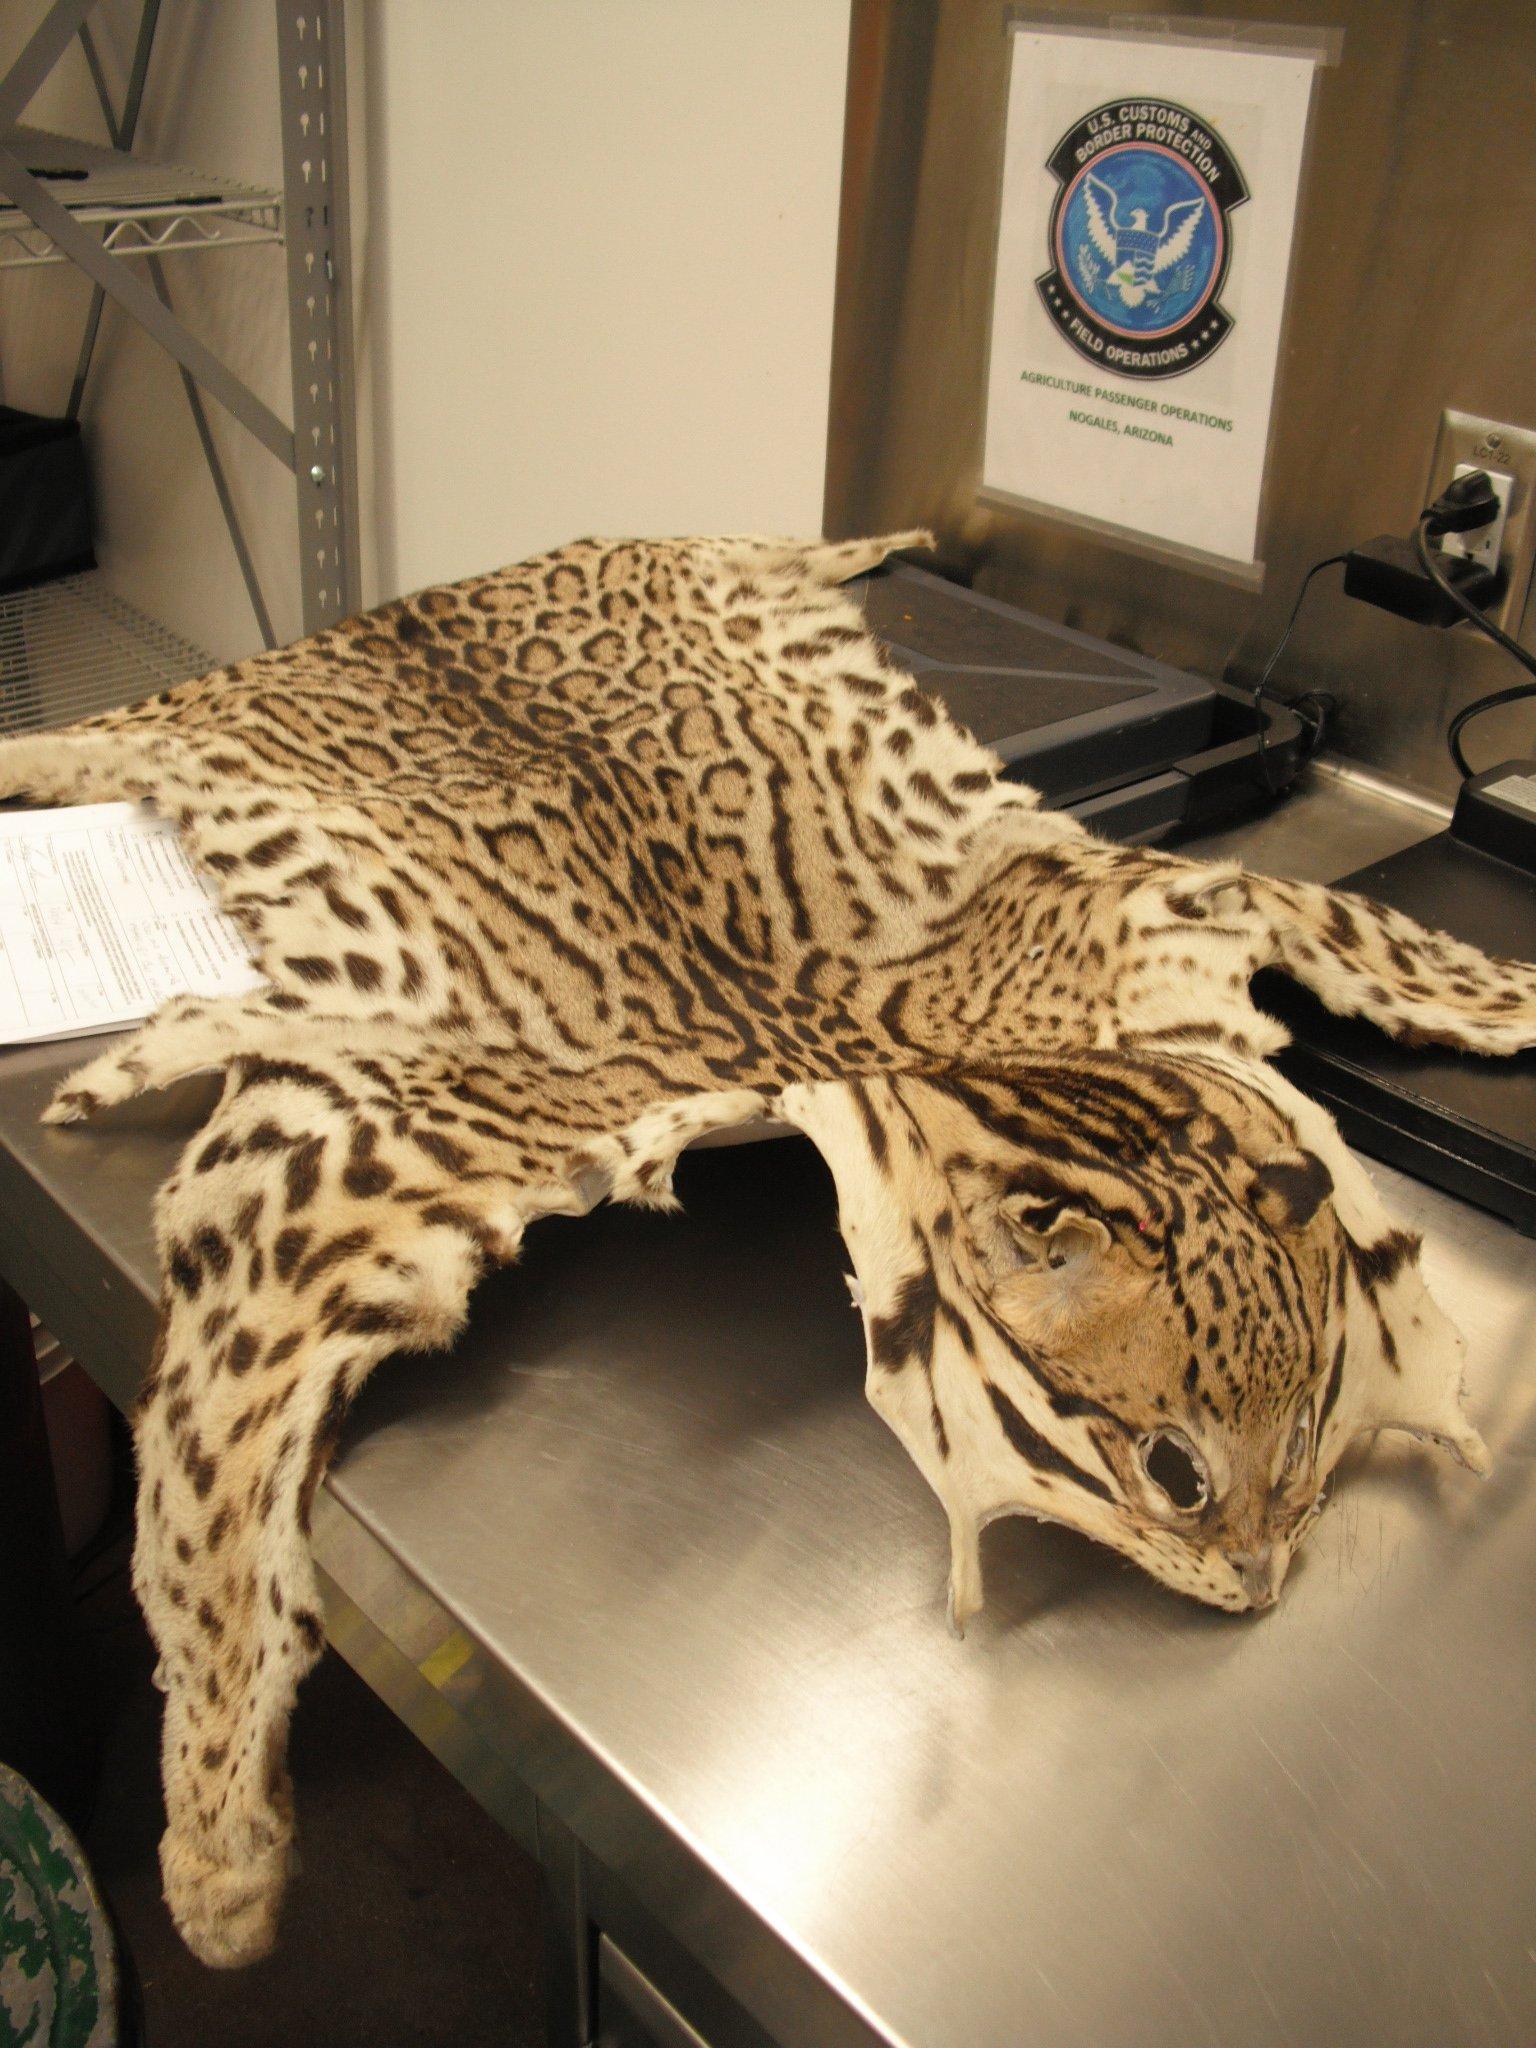 Ocelot pelt seized (Source: U.S. Customs and Border Protection)